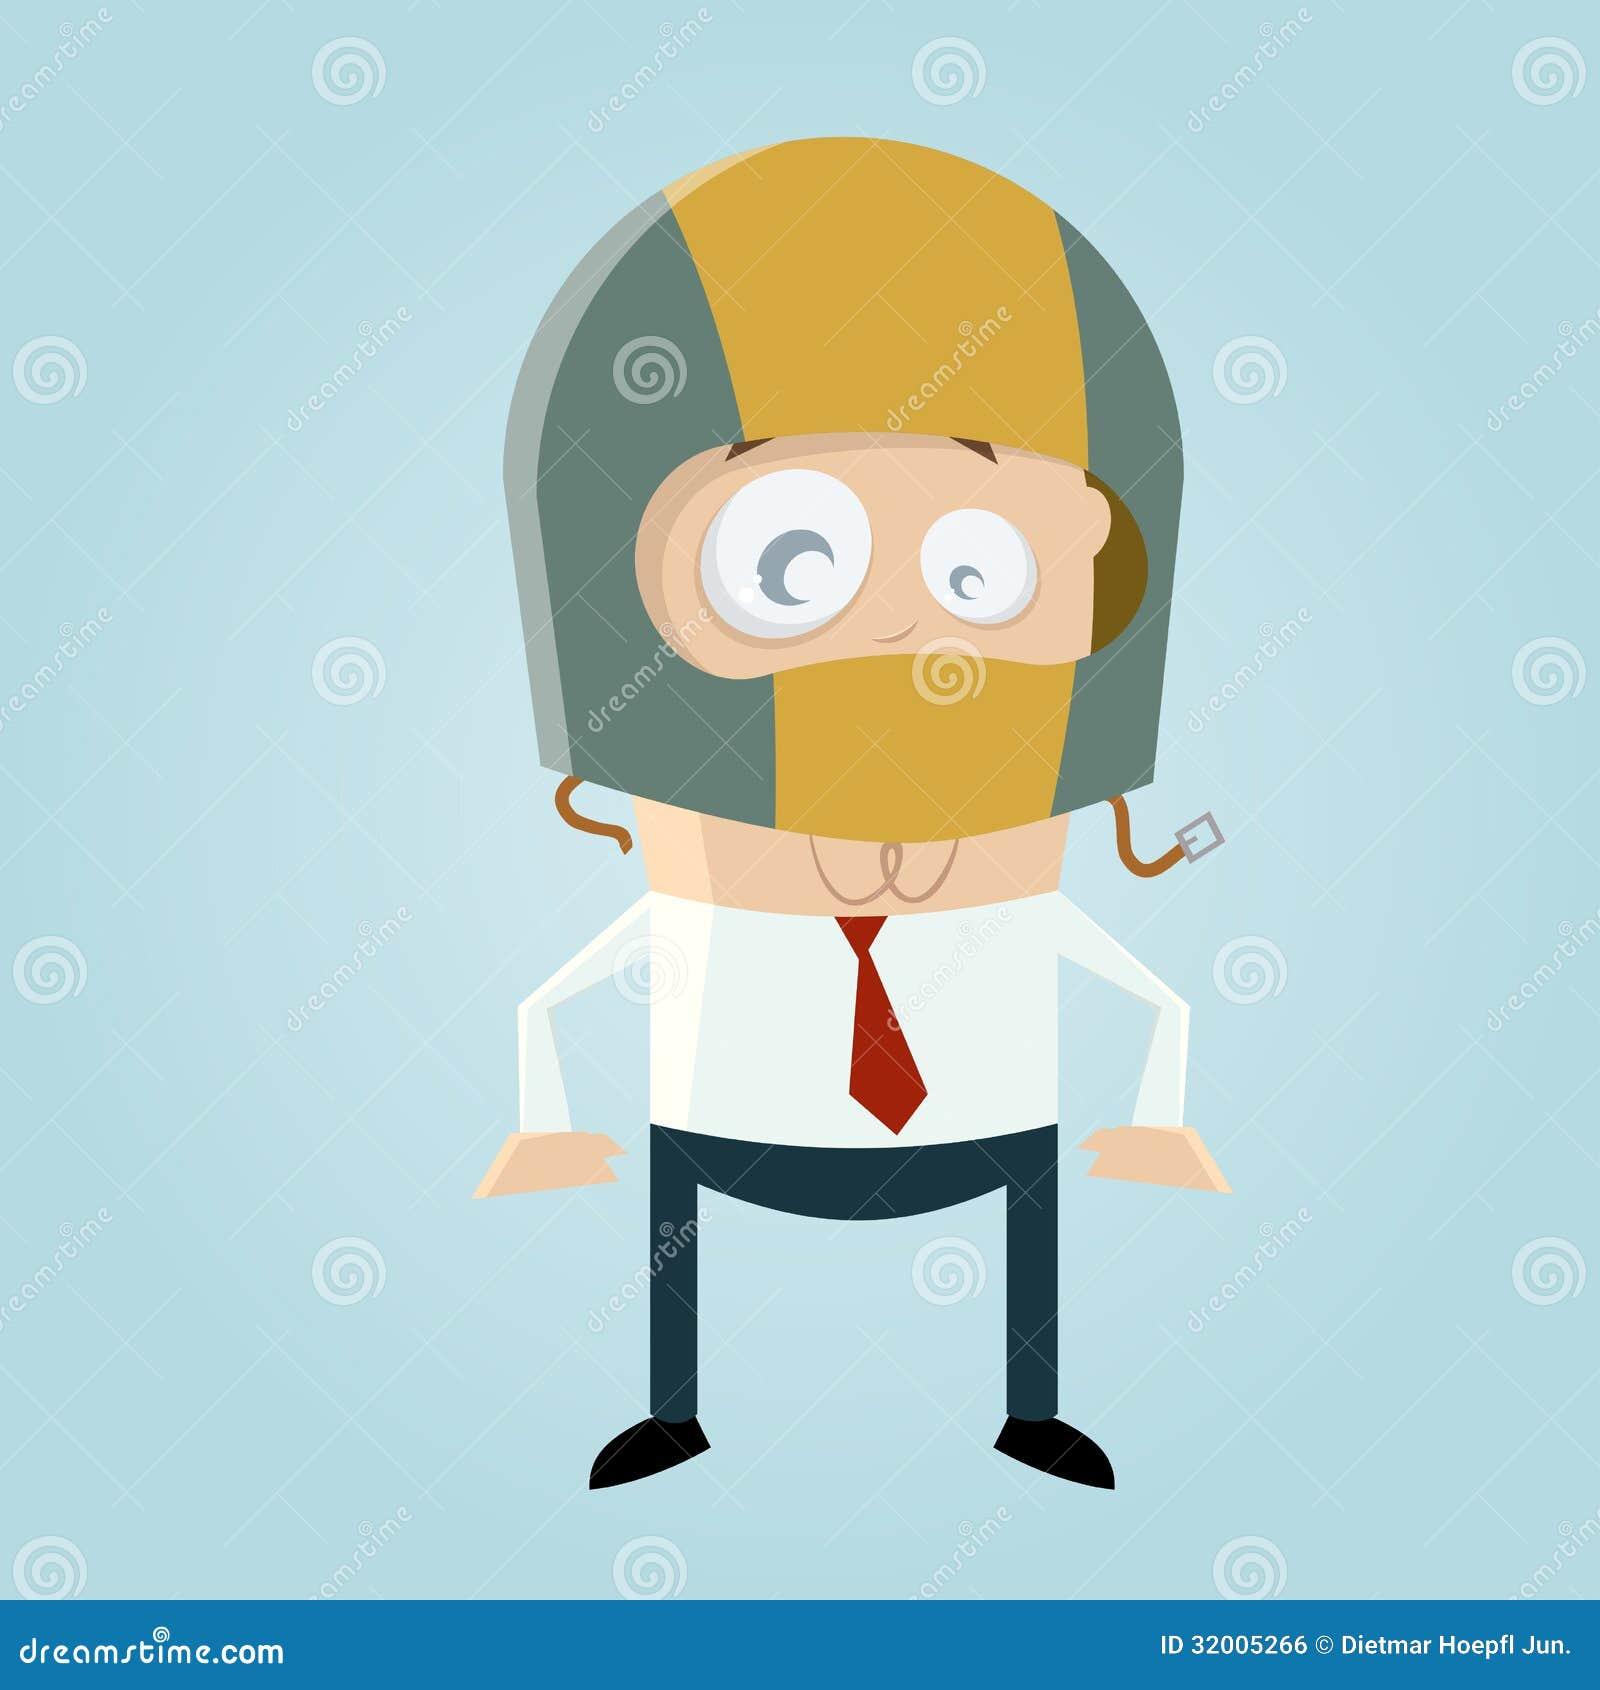 Funny Cartoon Man With Crash Helmet Stock Vector - Image ...